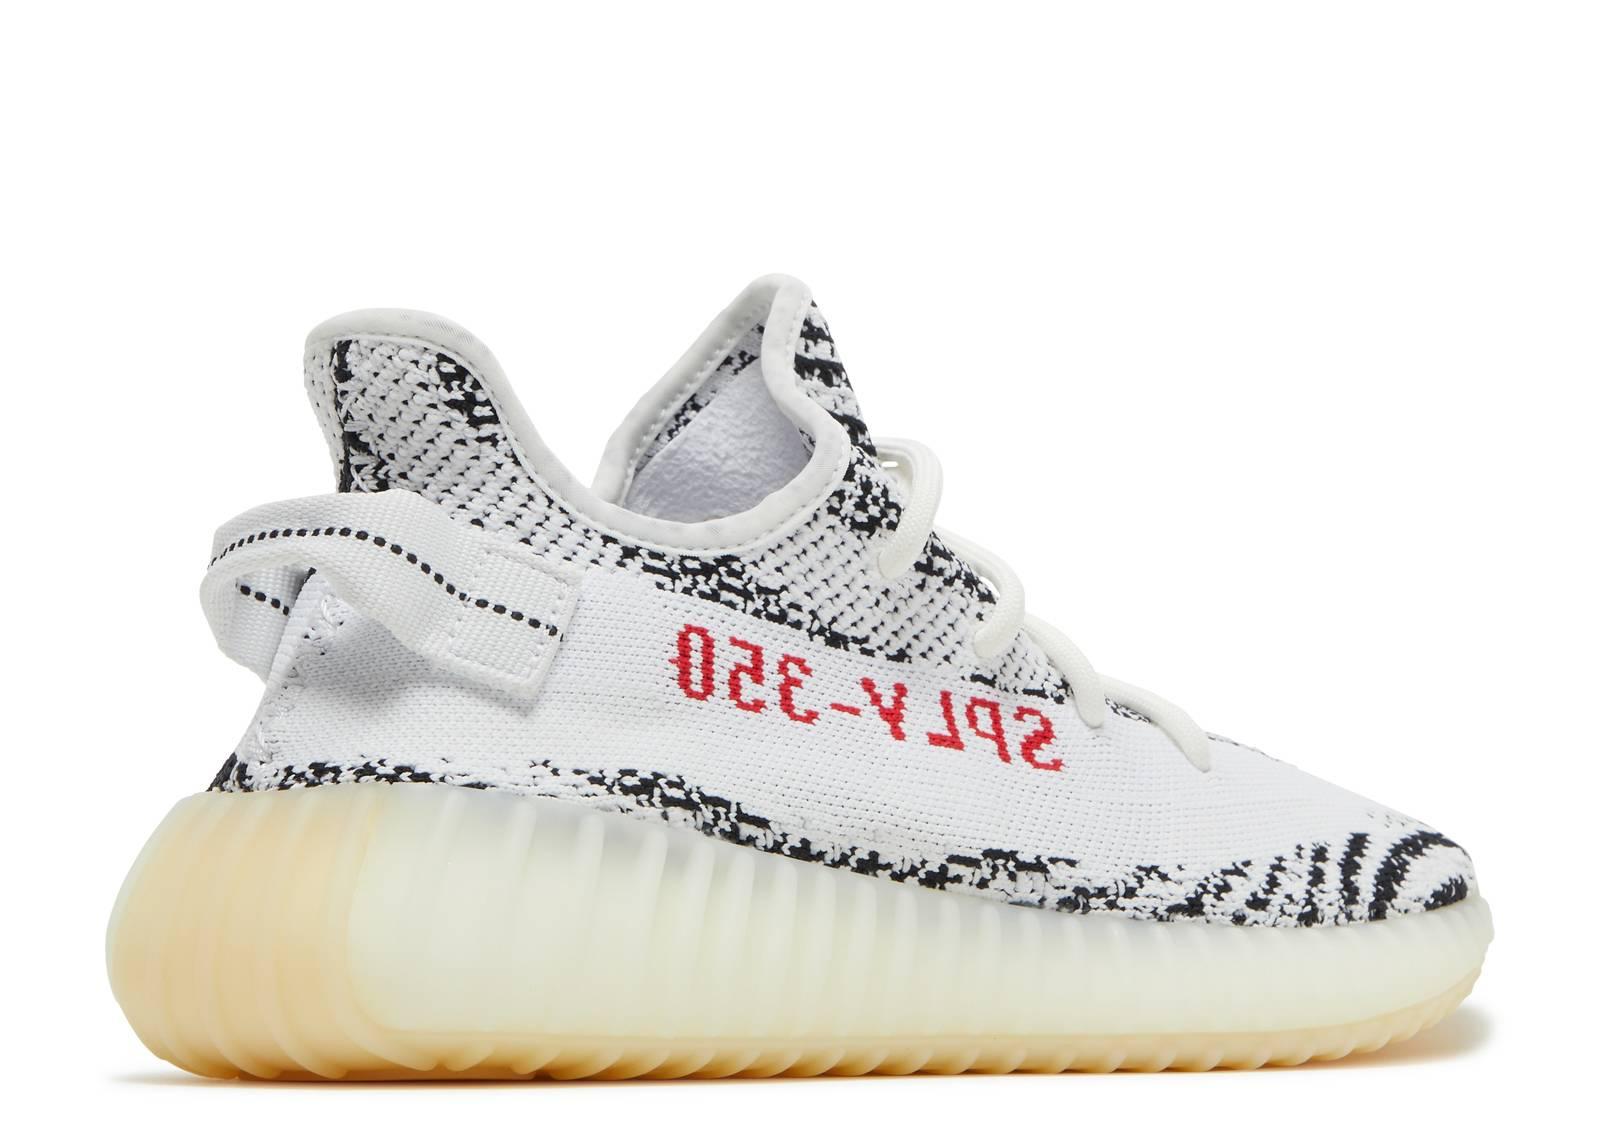 adidas. yeezy boost 350 v2 \u0026quot;zebra\u0026quot;